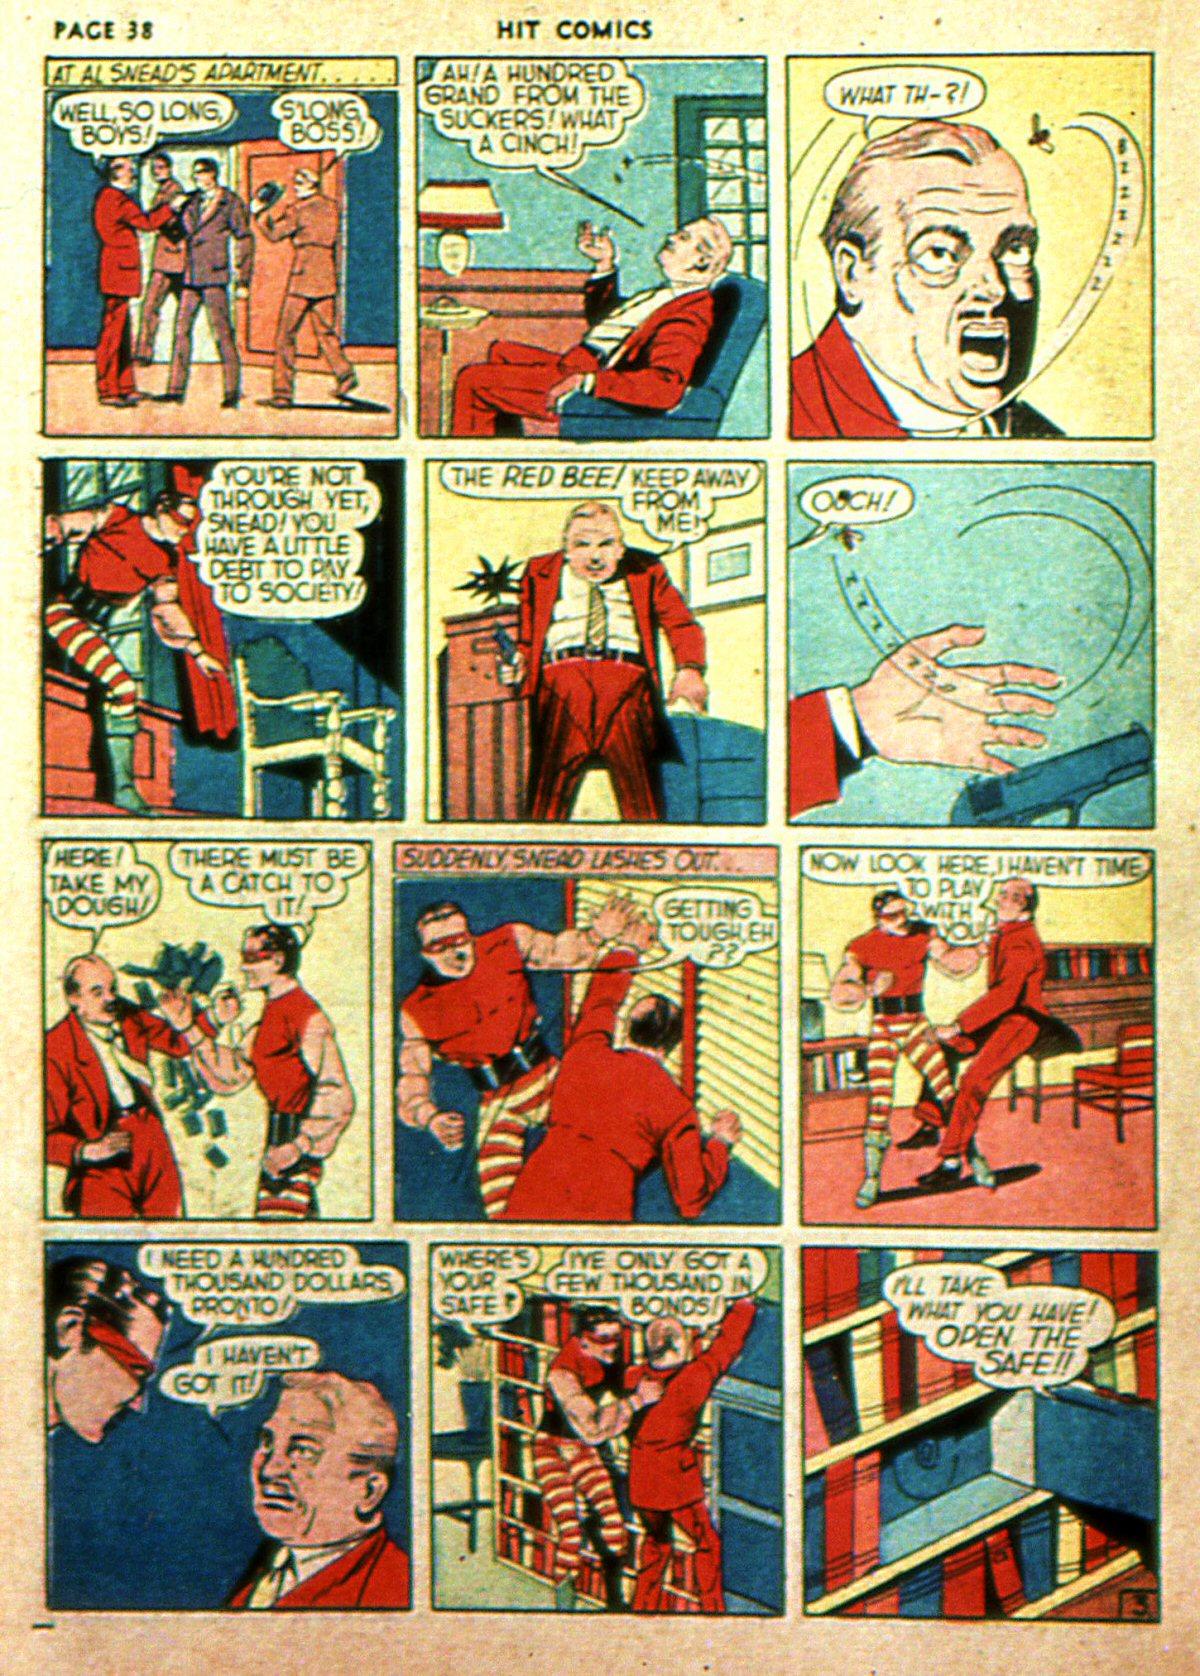 Read online Hit Comics comic -  Issue #2 - 40